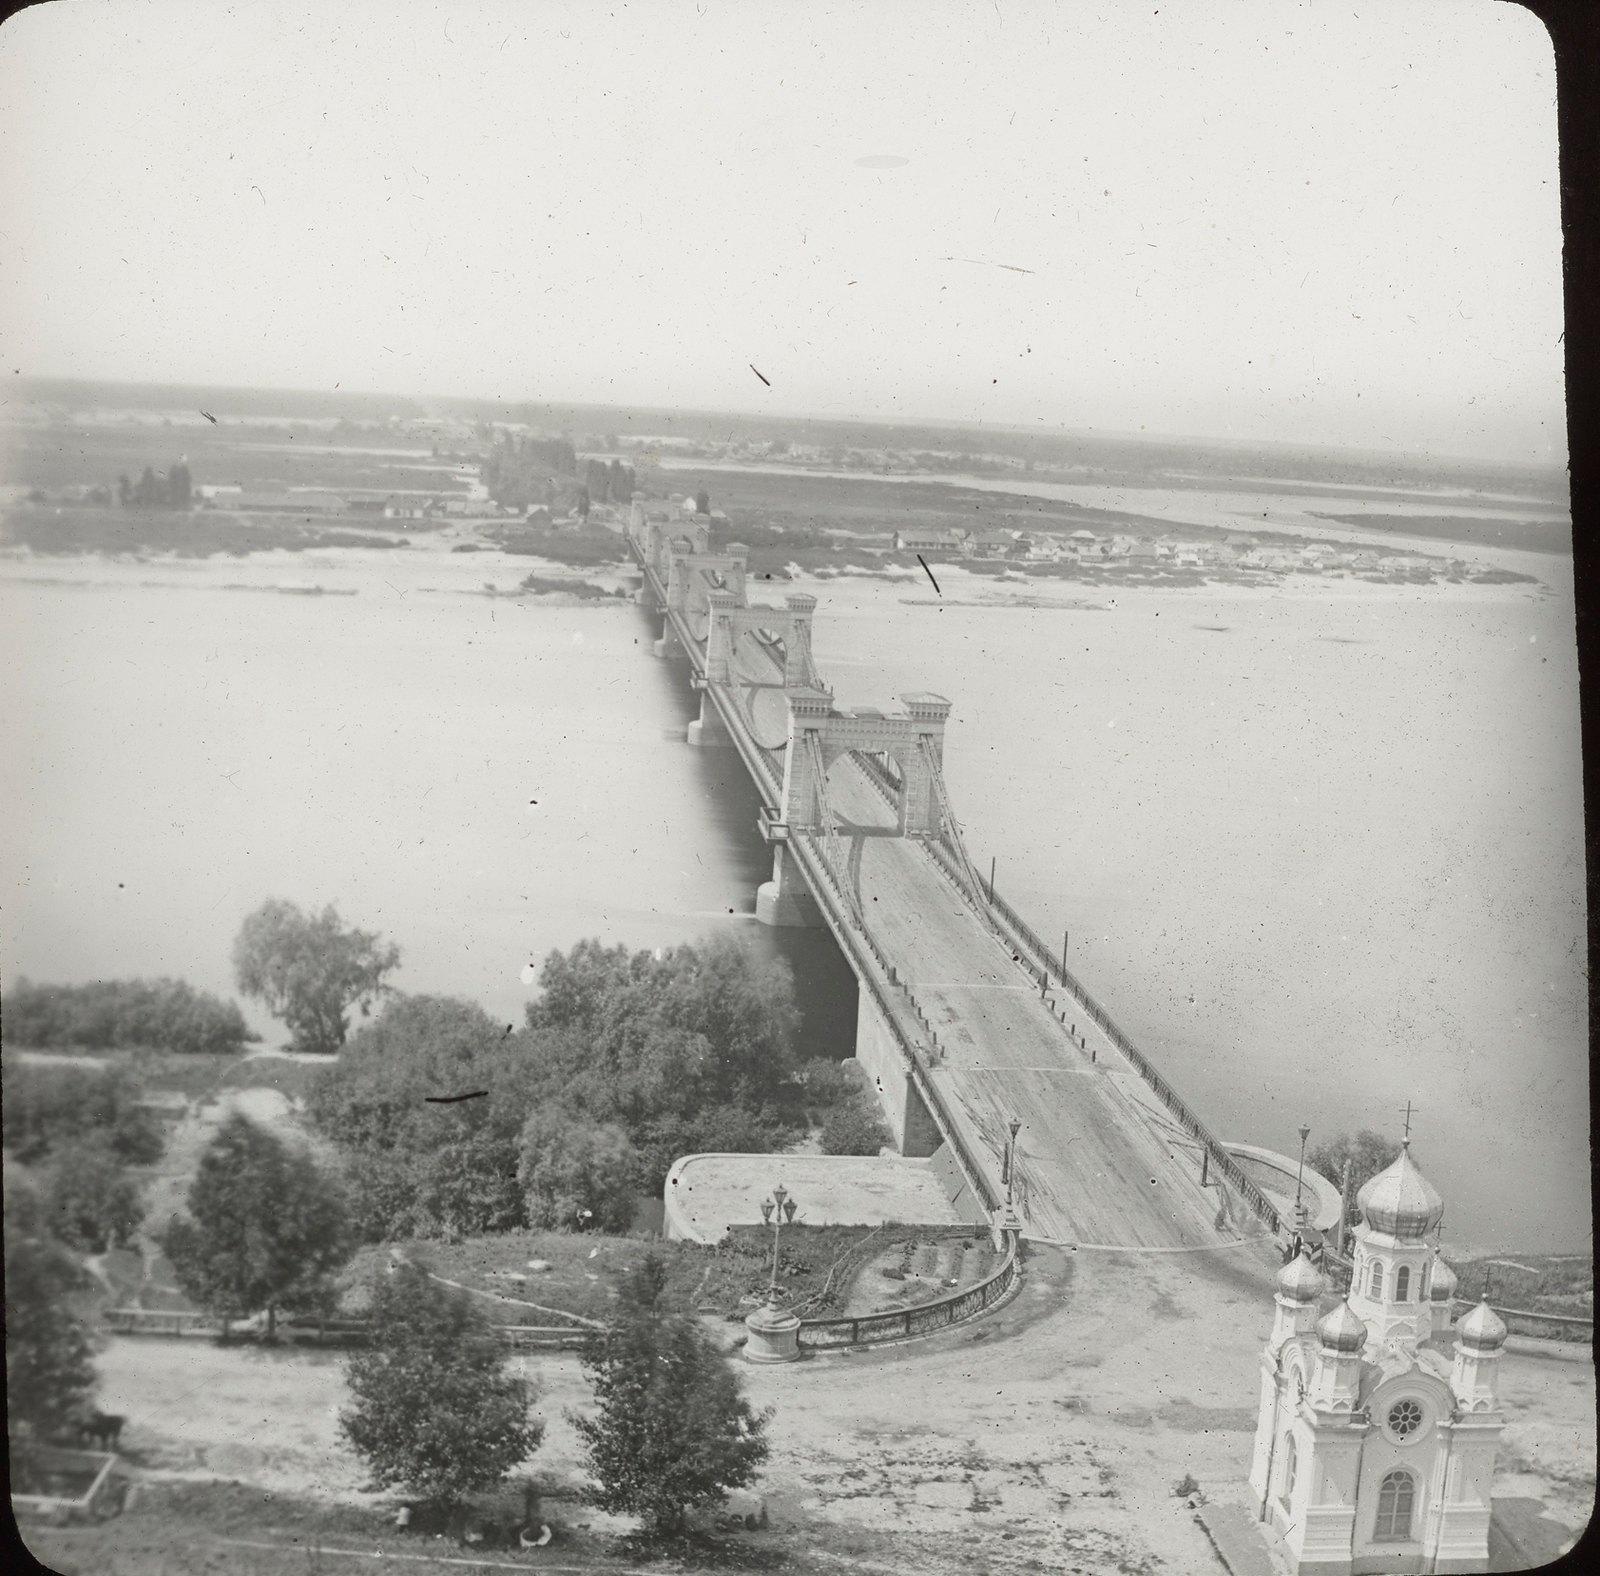 Киев. Мост через Днепр